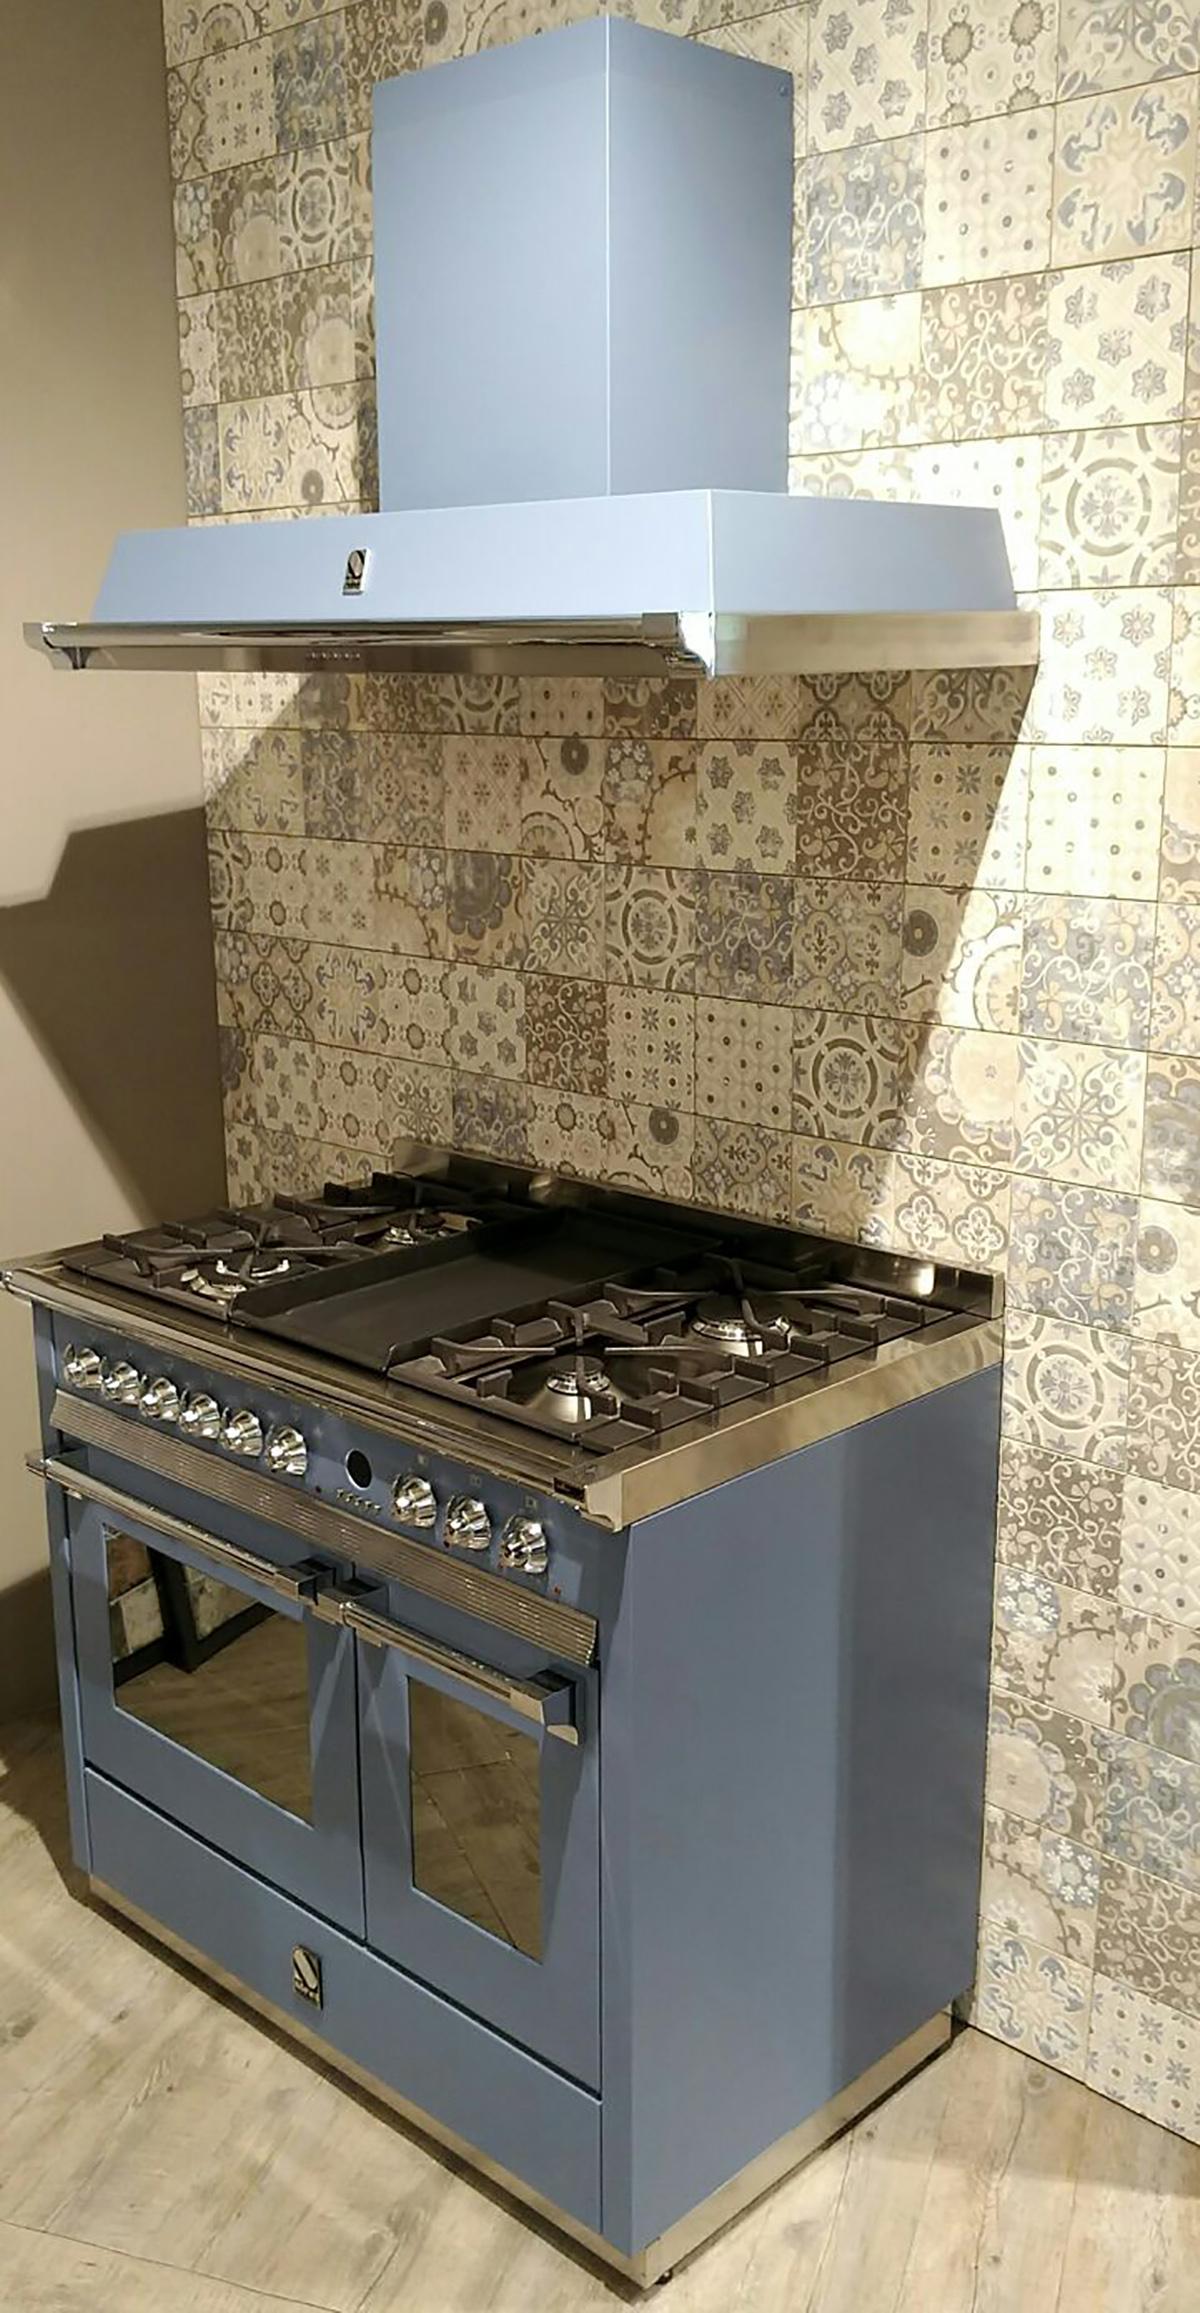 Blocco Cucina Steel Ascot 100 Cm